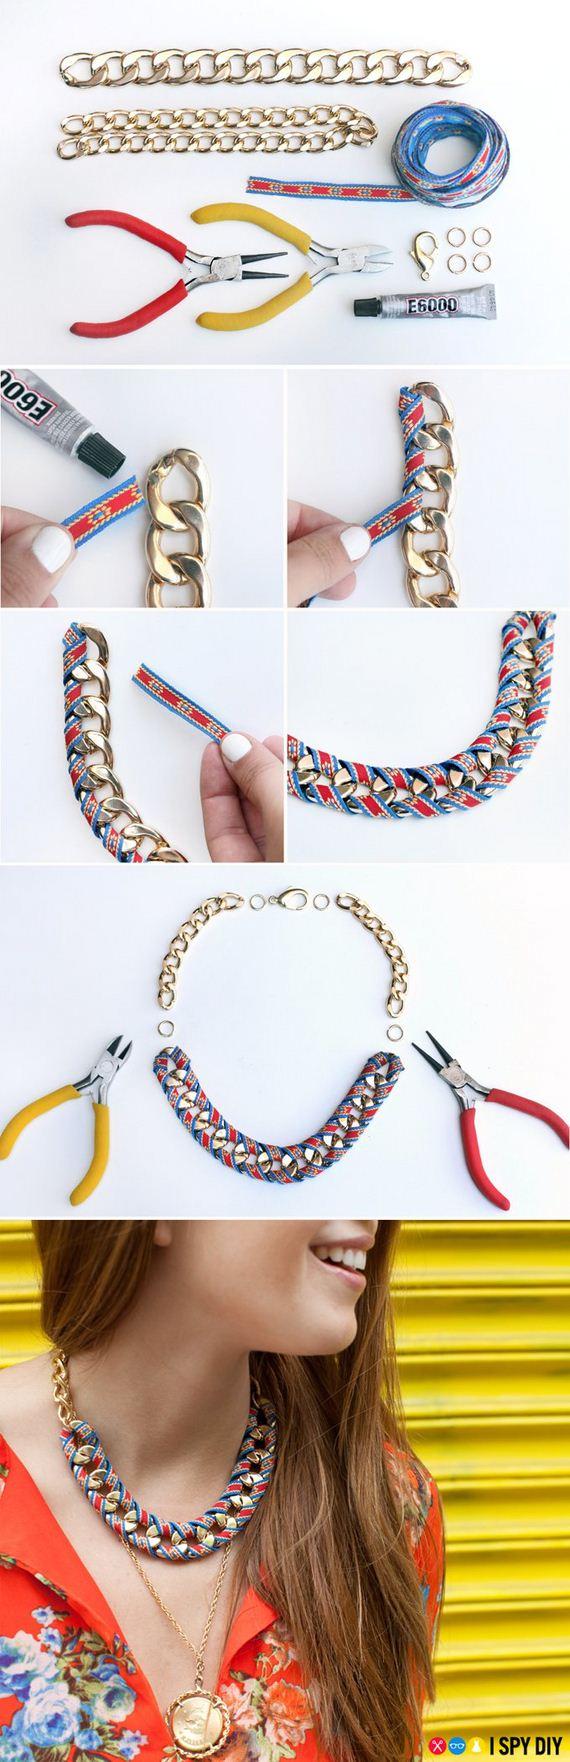 01-diy-statement-necklace-jewelry-tutorial-ideas